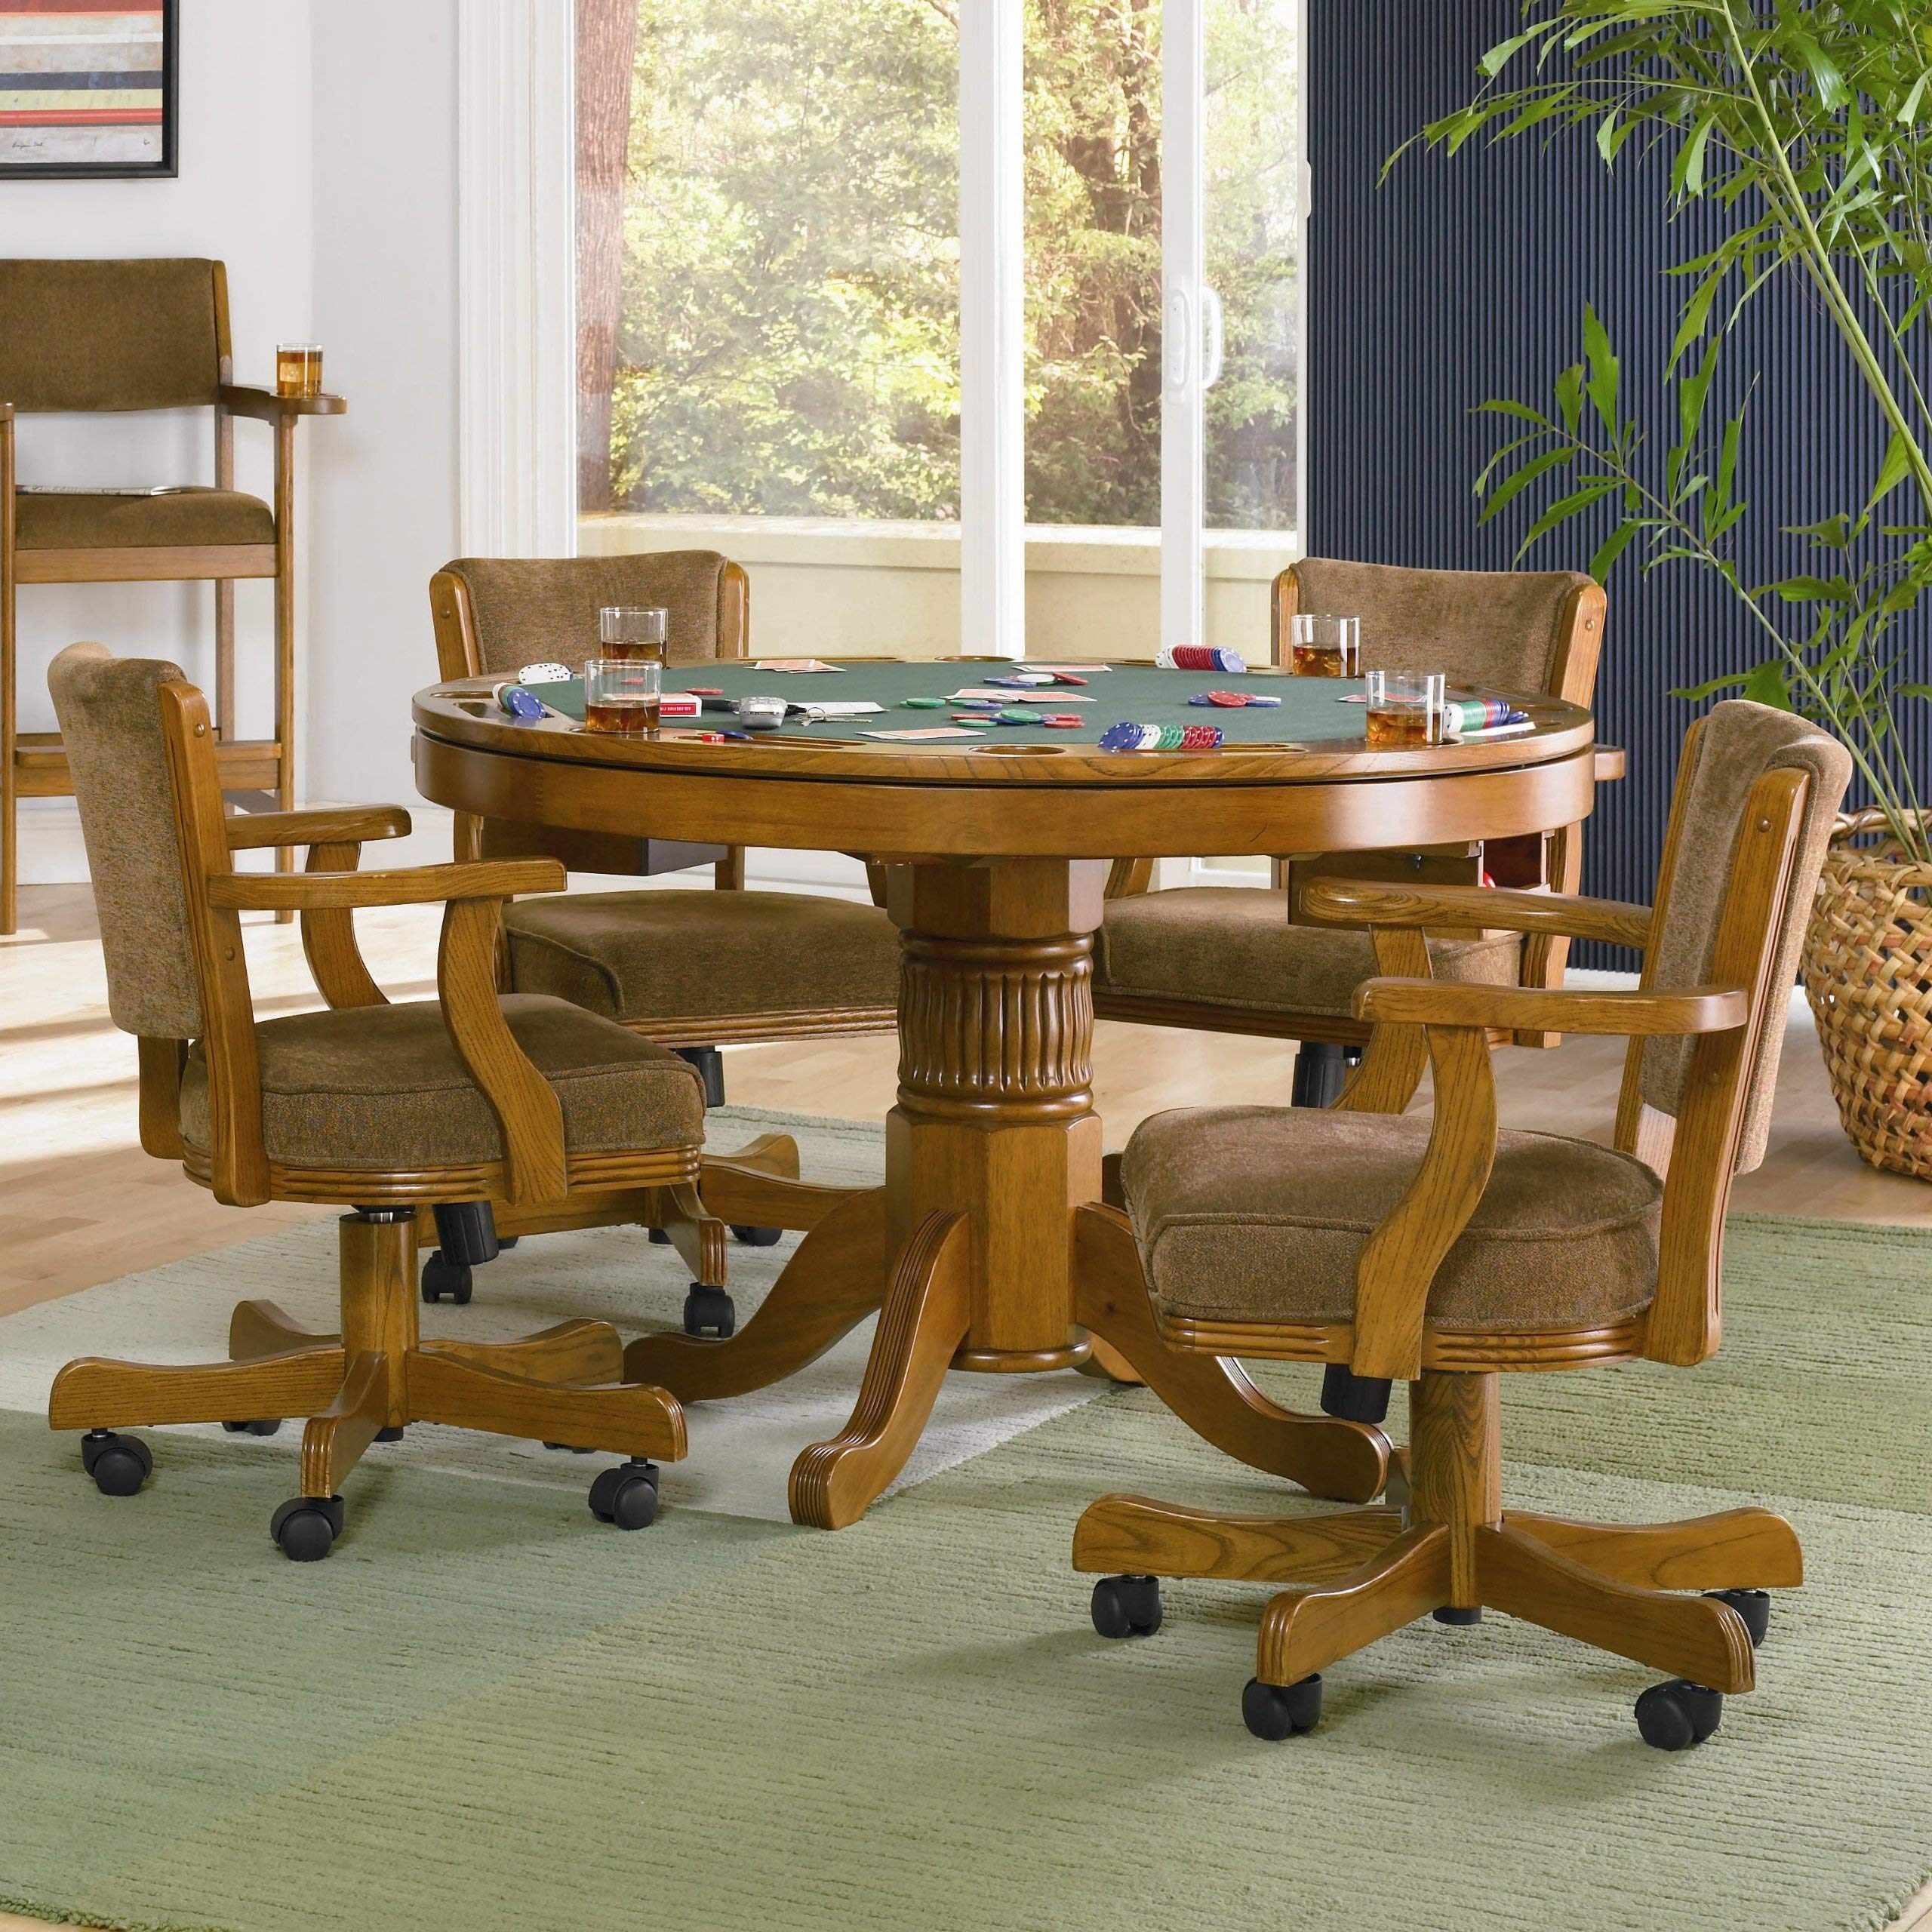 Coaster Oak Game Table Top Box 1 of 2-Oak by Coaster Home Furnishings